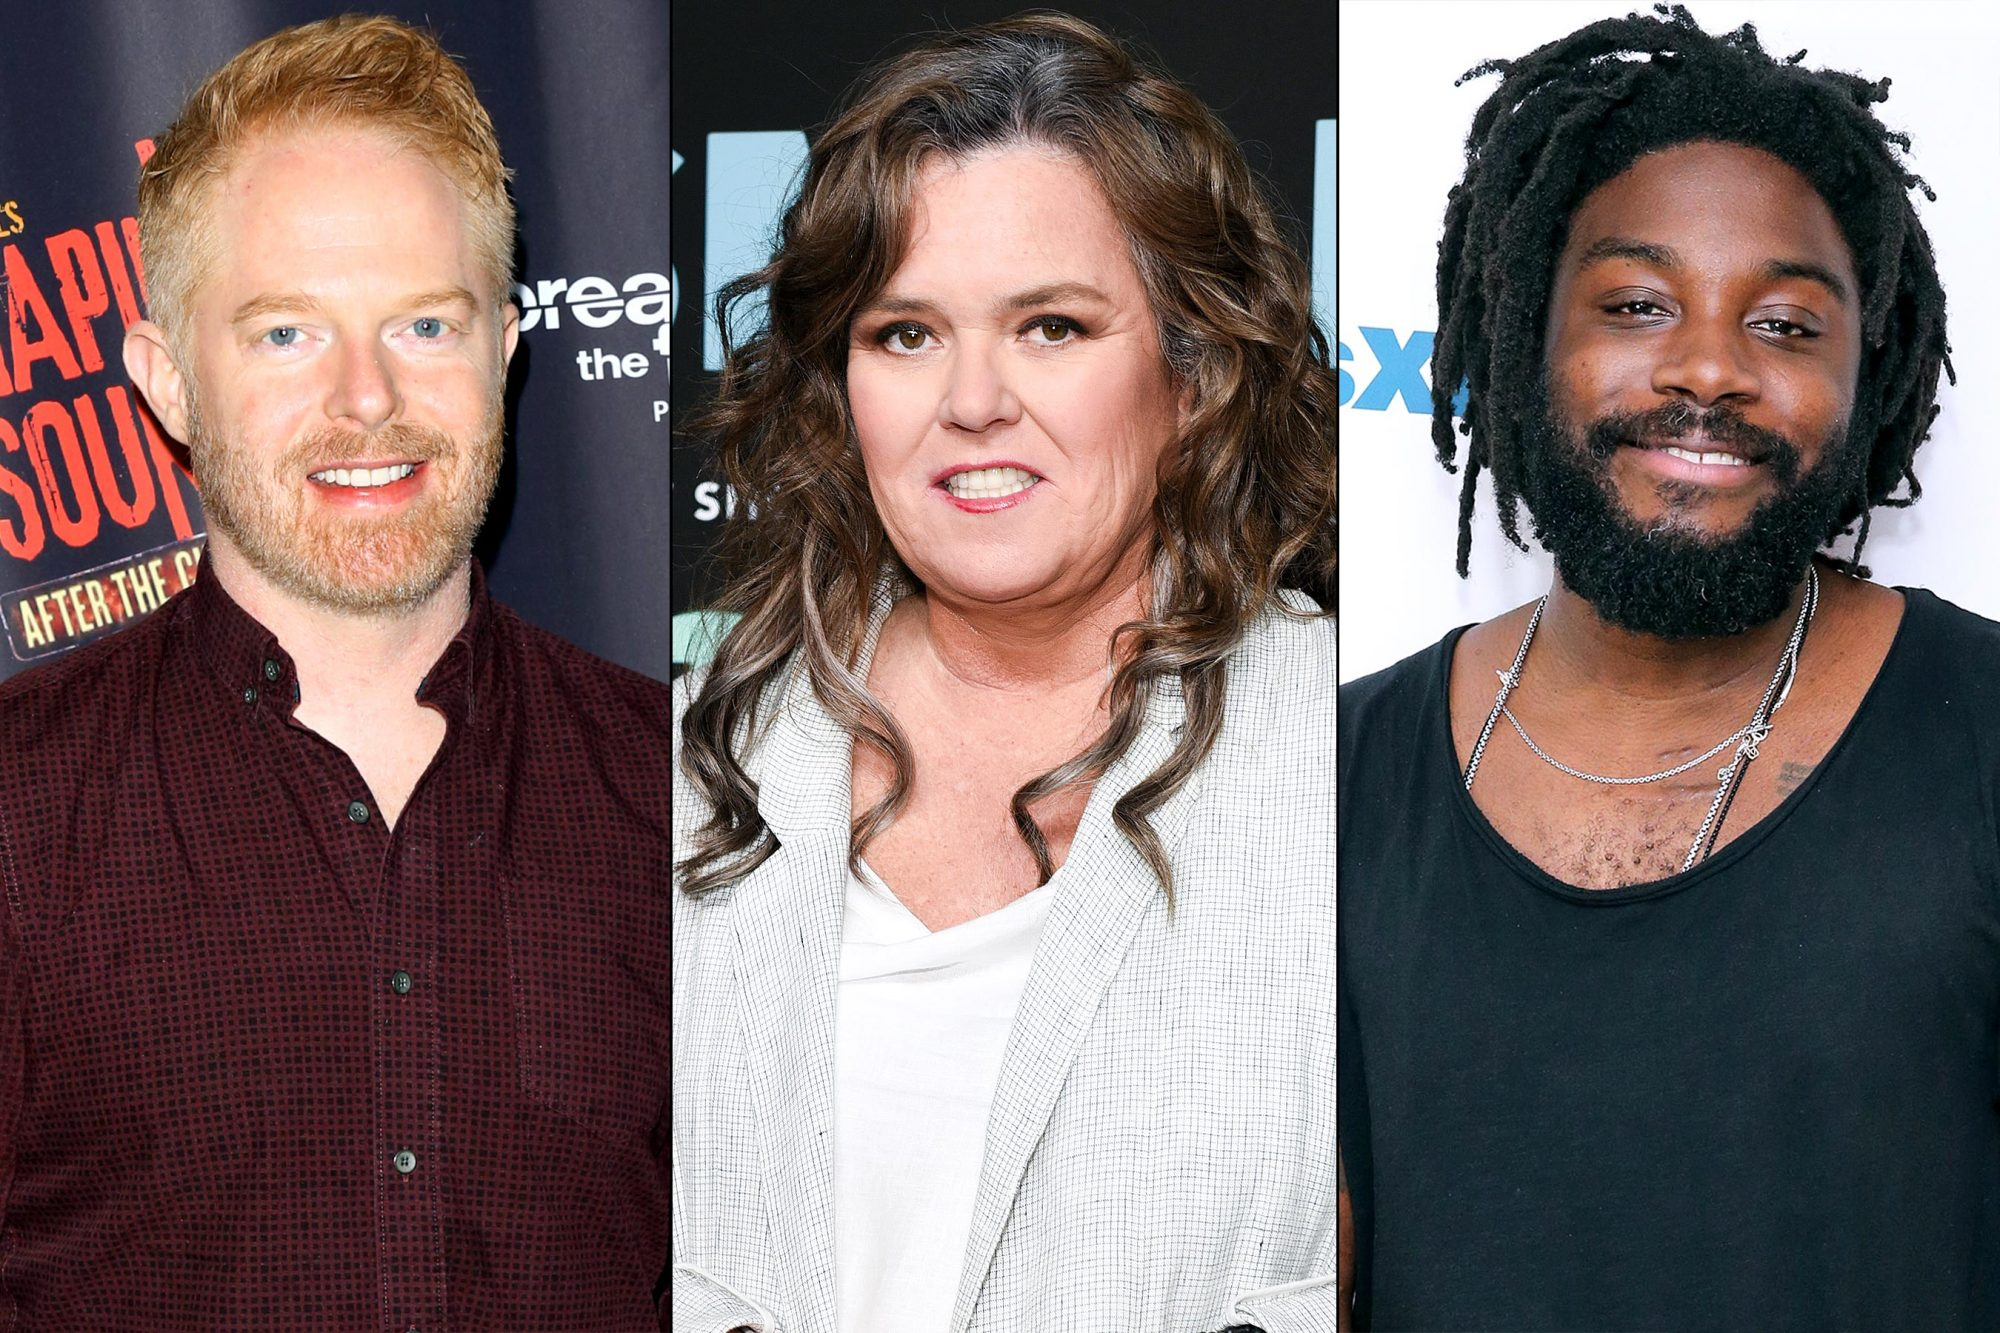 Jesse Tyler Ferguson / Rosie O'Donnell / Jason Reynolds